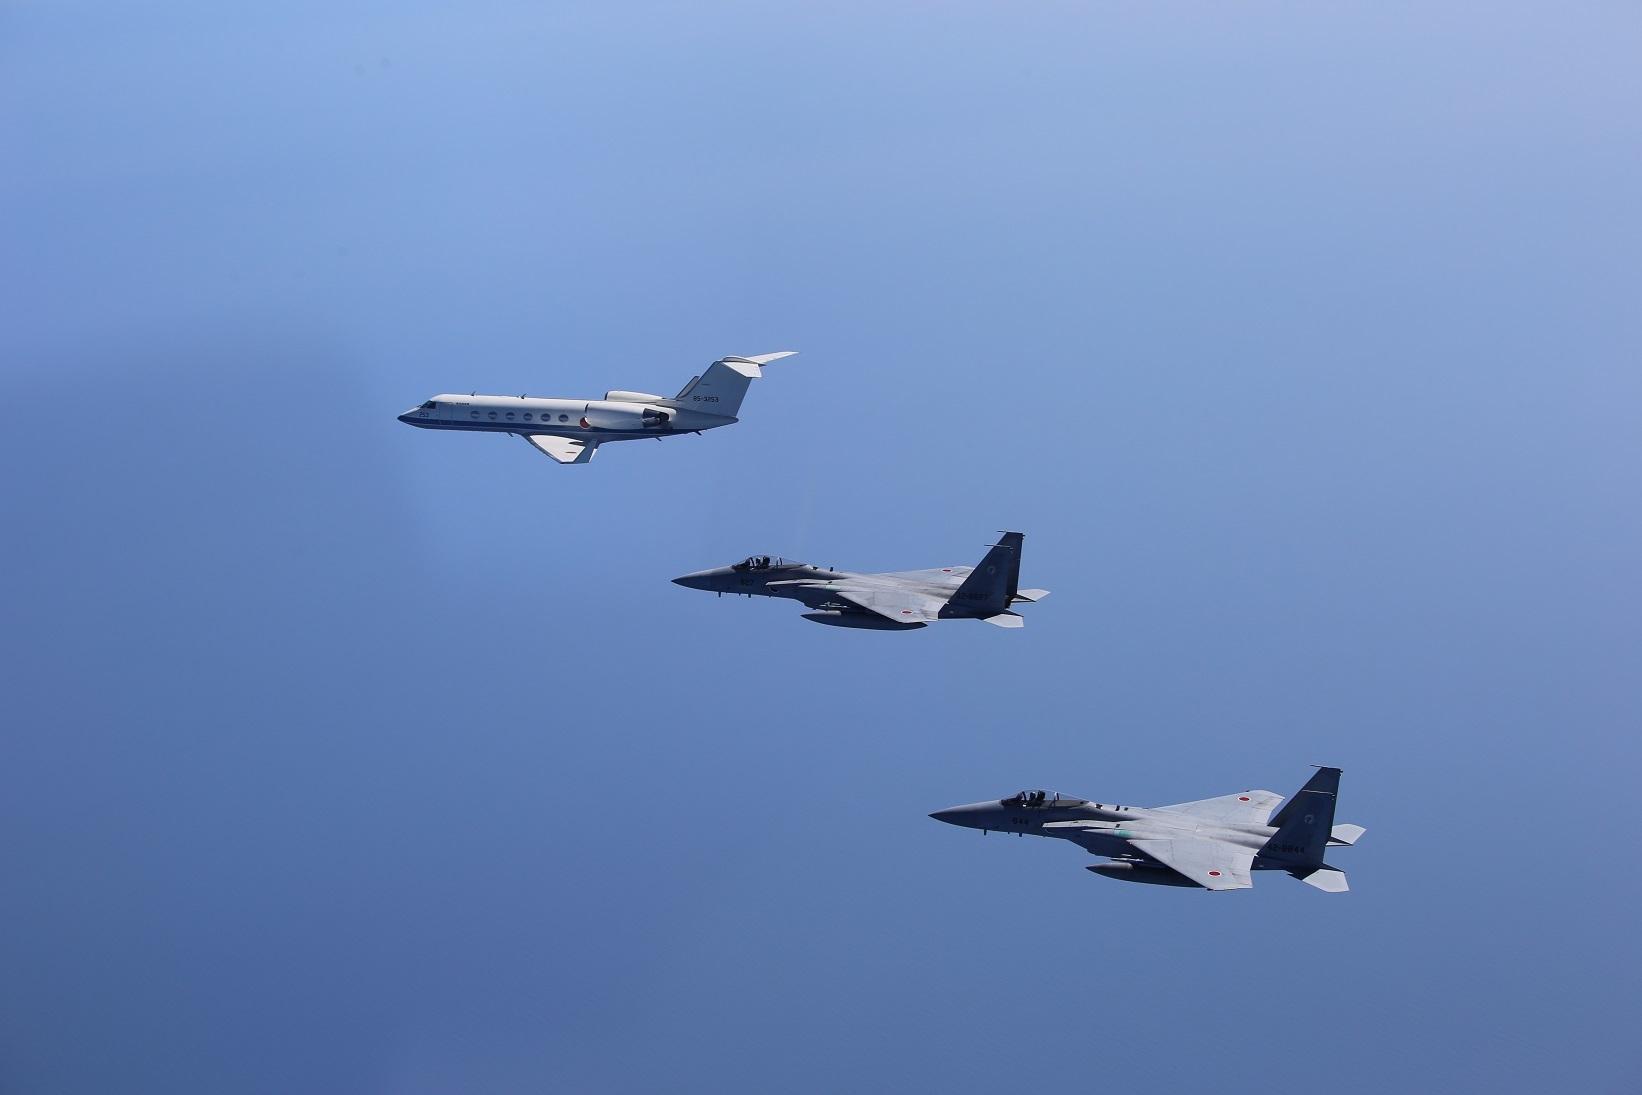 C-2体験搭乗記:その4_b0015356_23042161.jpg